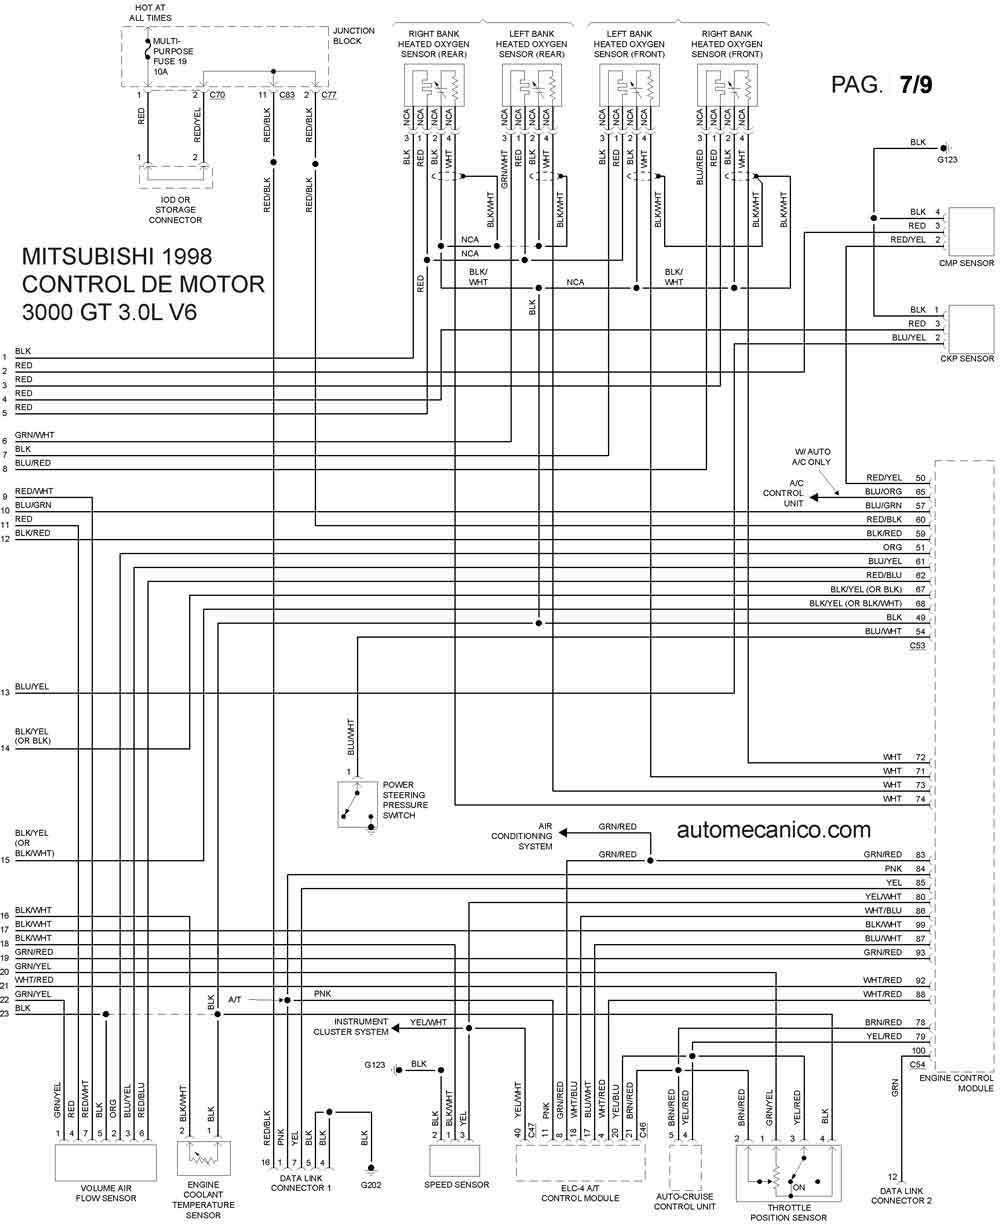 Guides Wiring Diagrams Wiring Diagrams 22 Of 103 Autozonecom